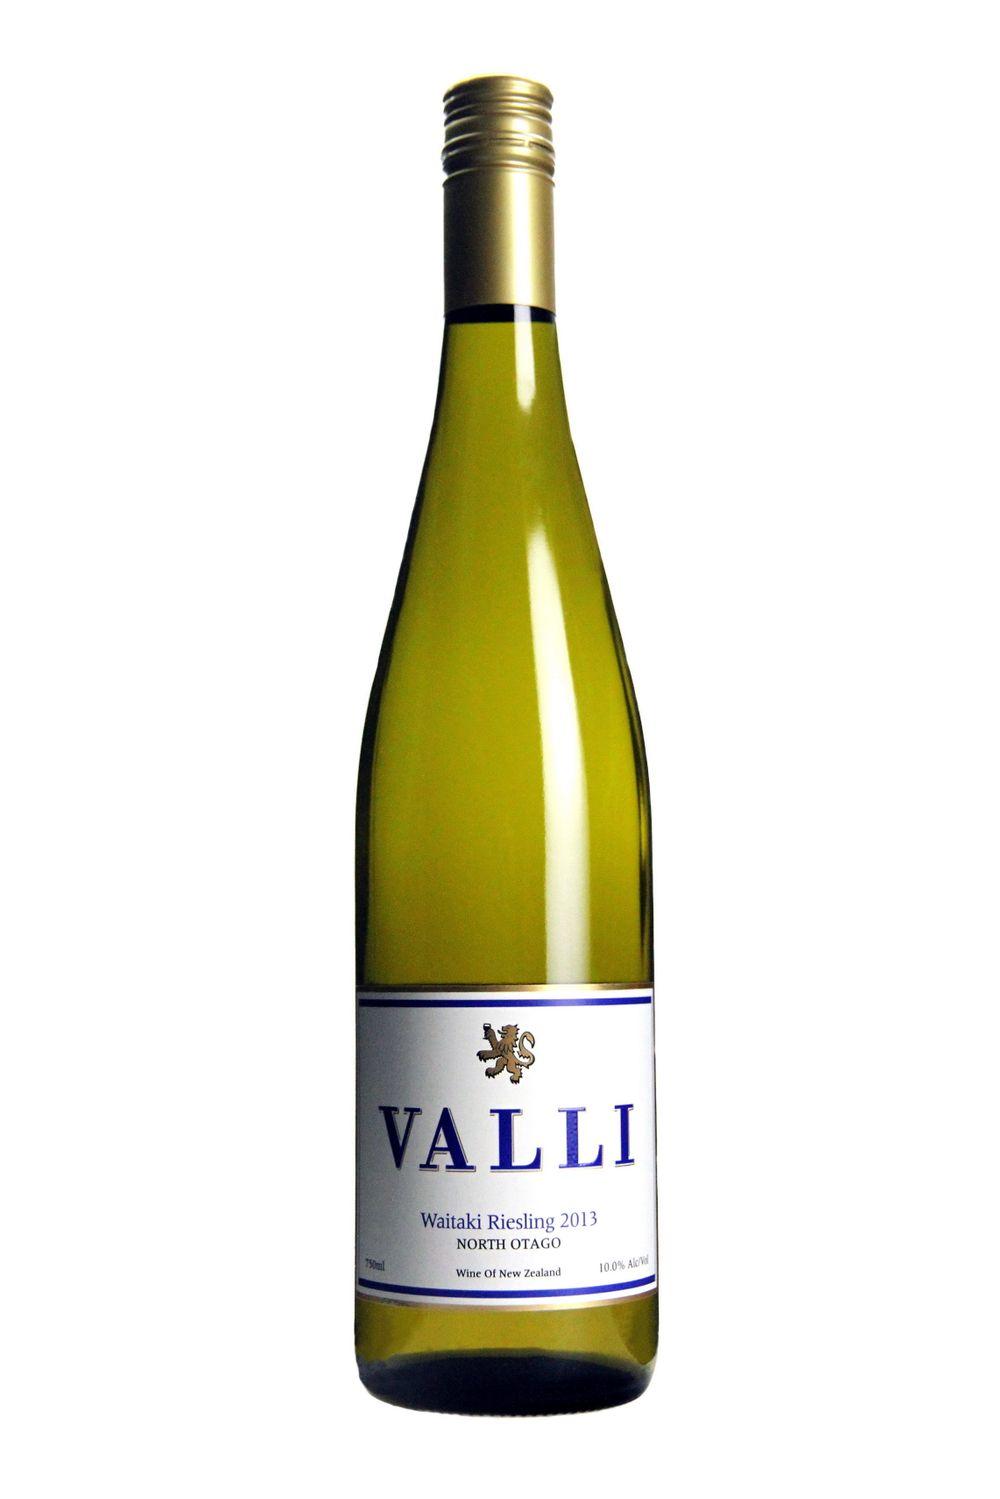 Valli Waitaki Riesling 2013